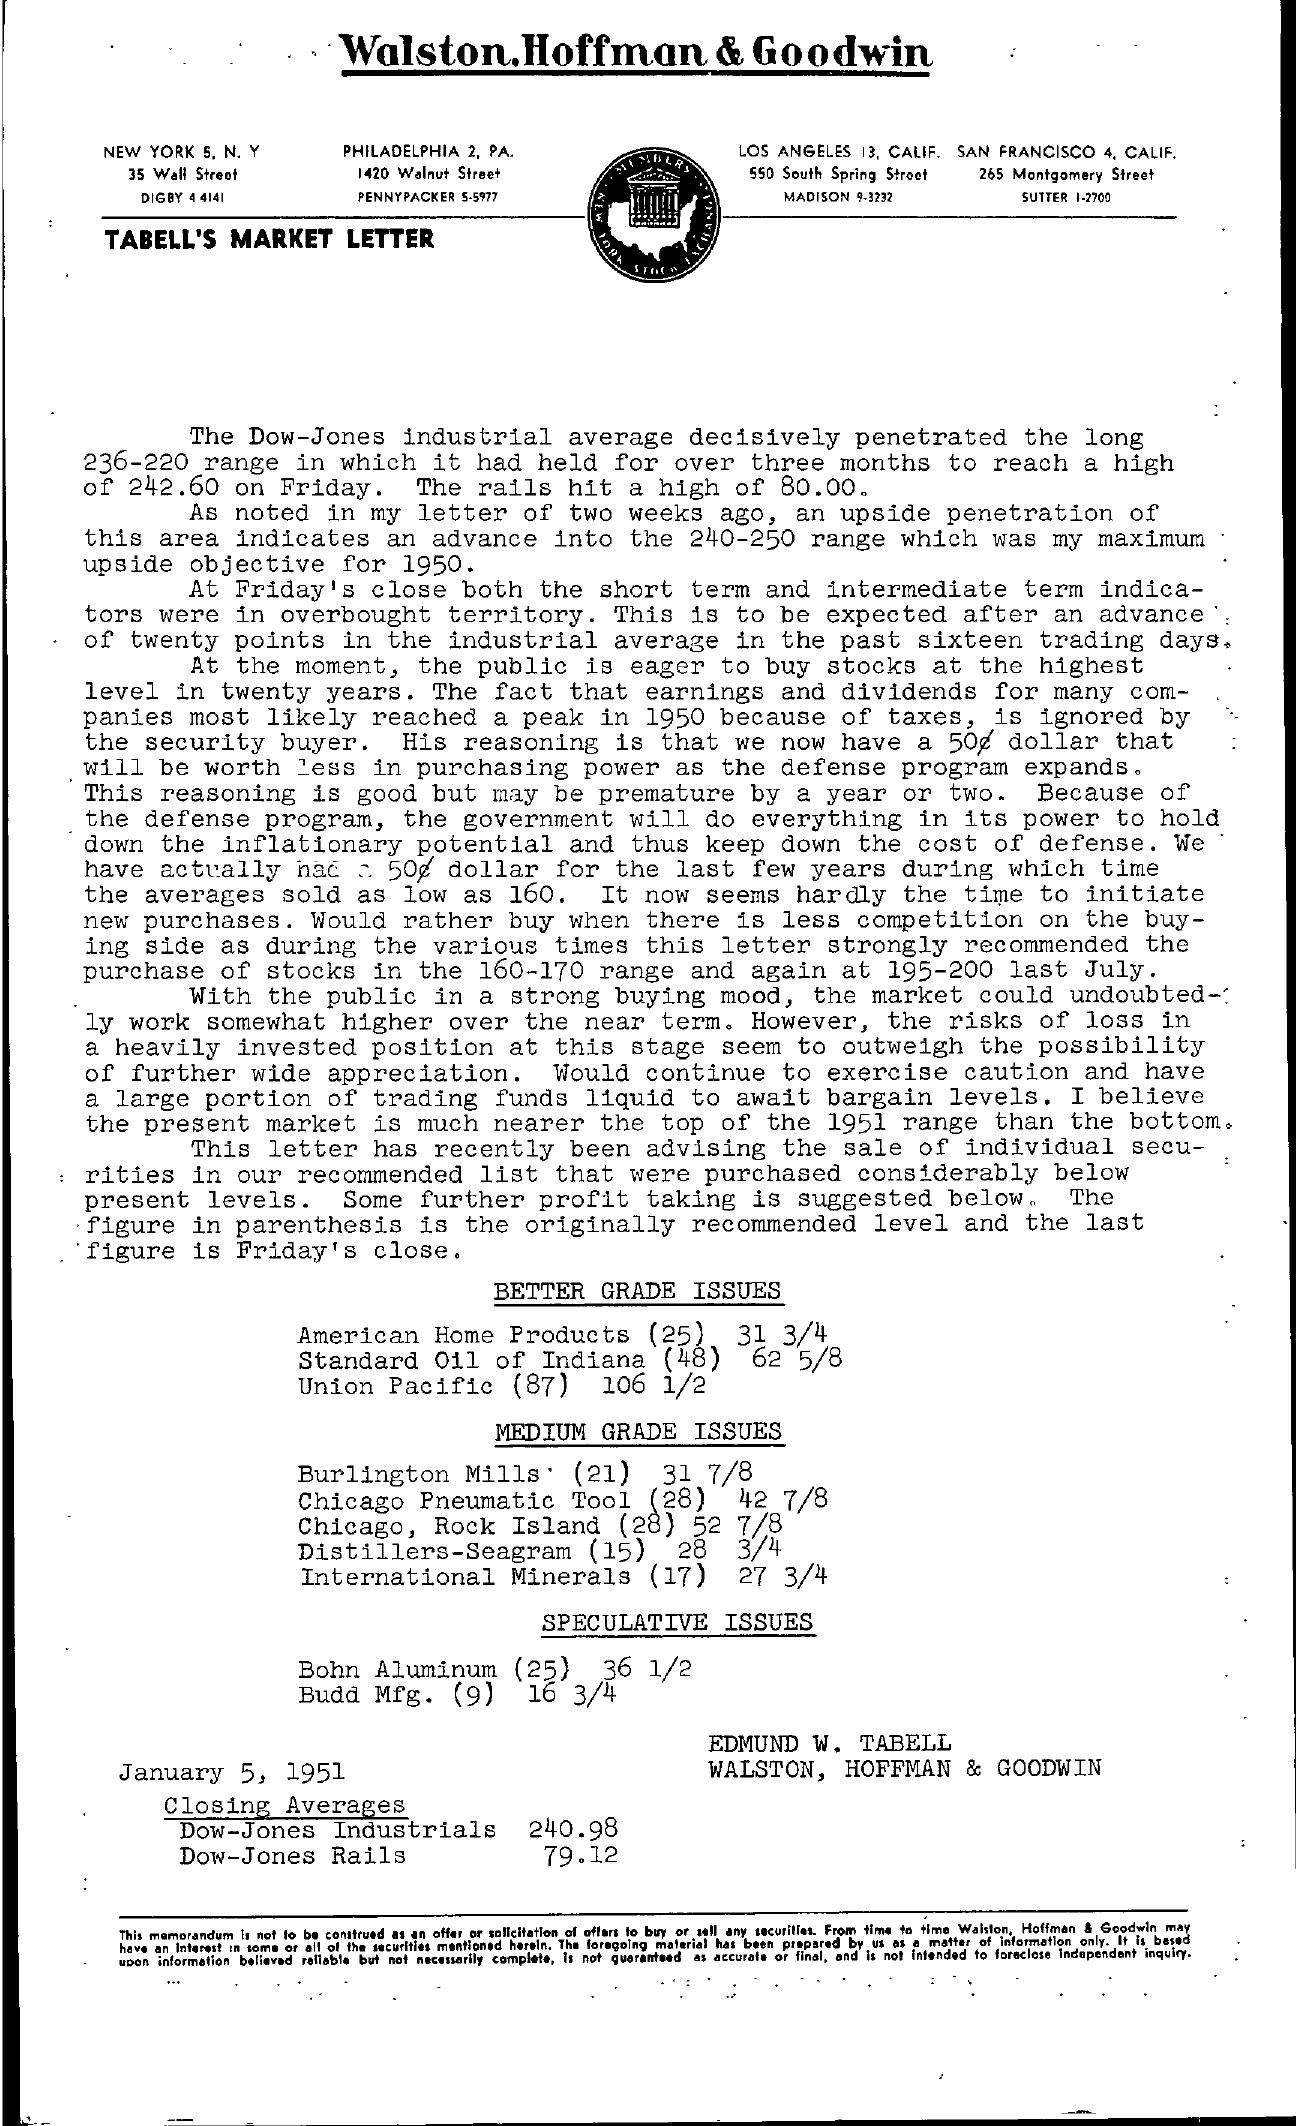 Tabell's Market Letter - January 05, 1951